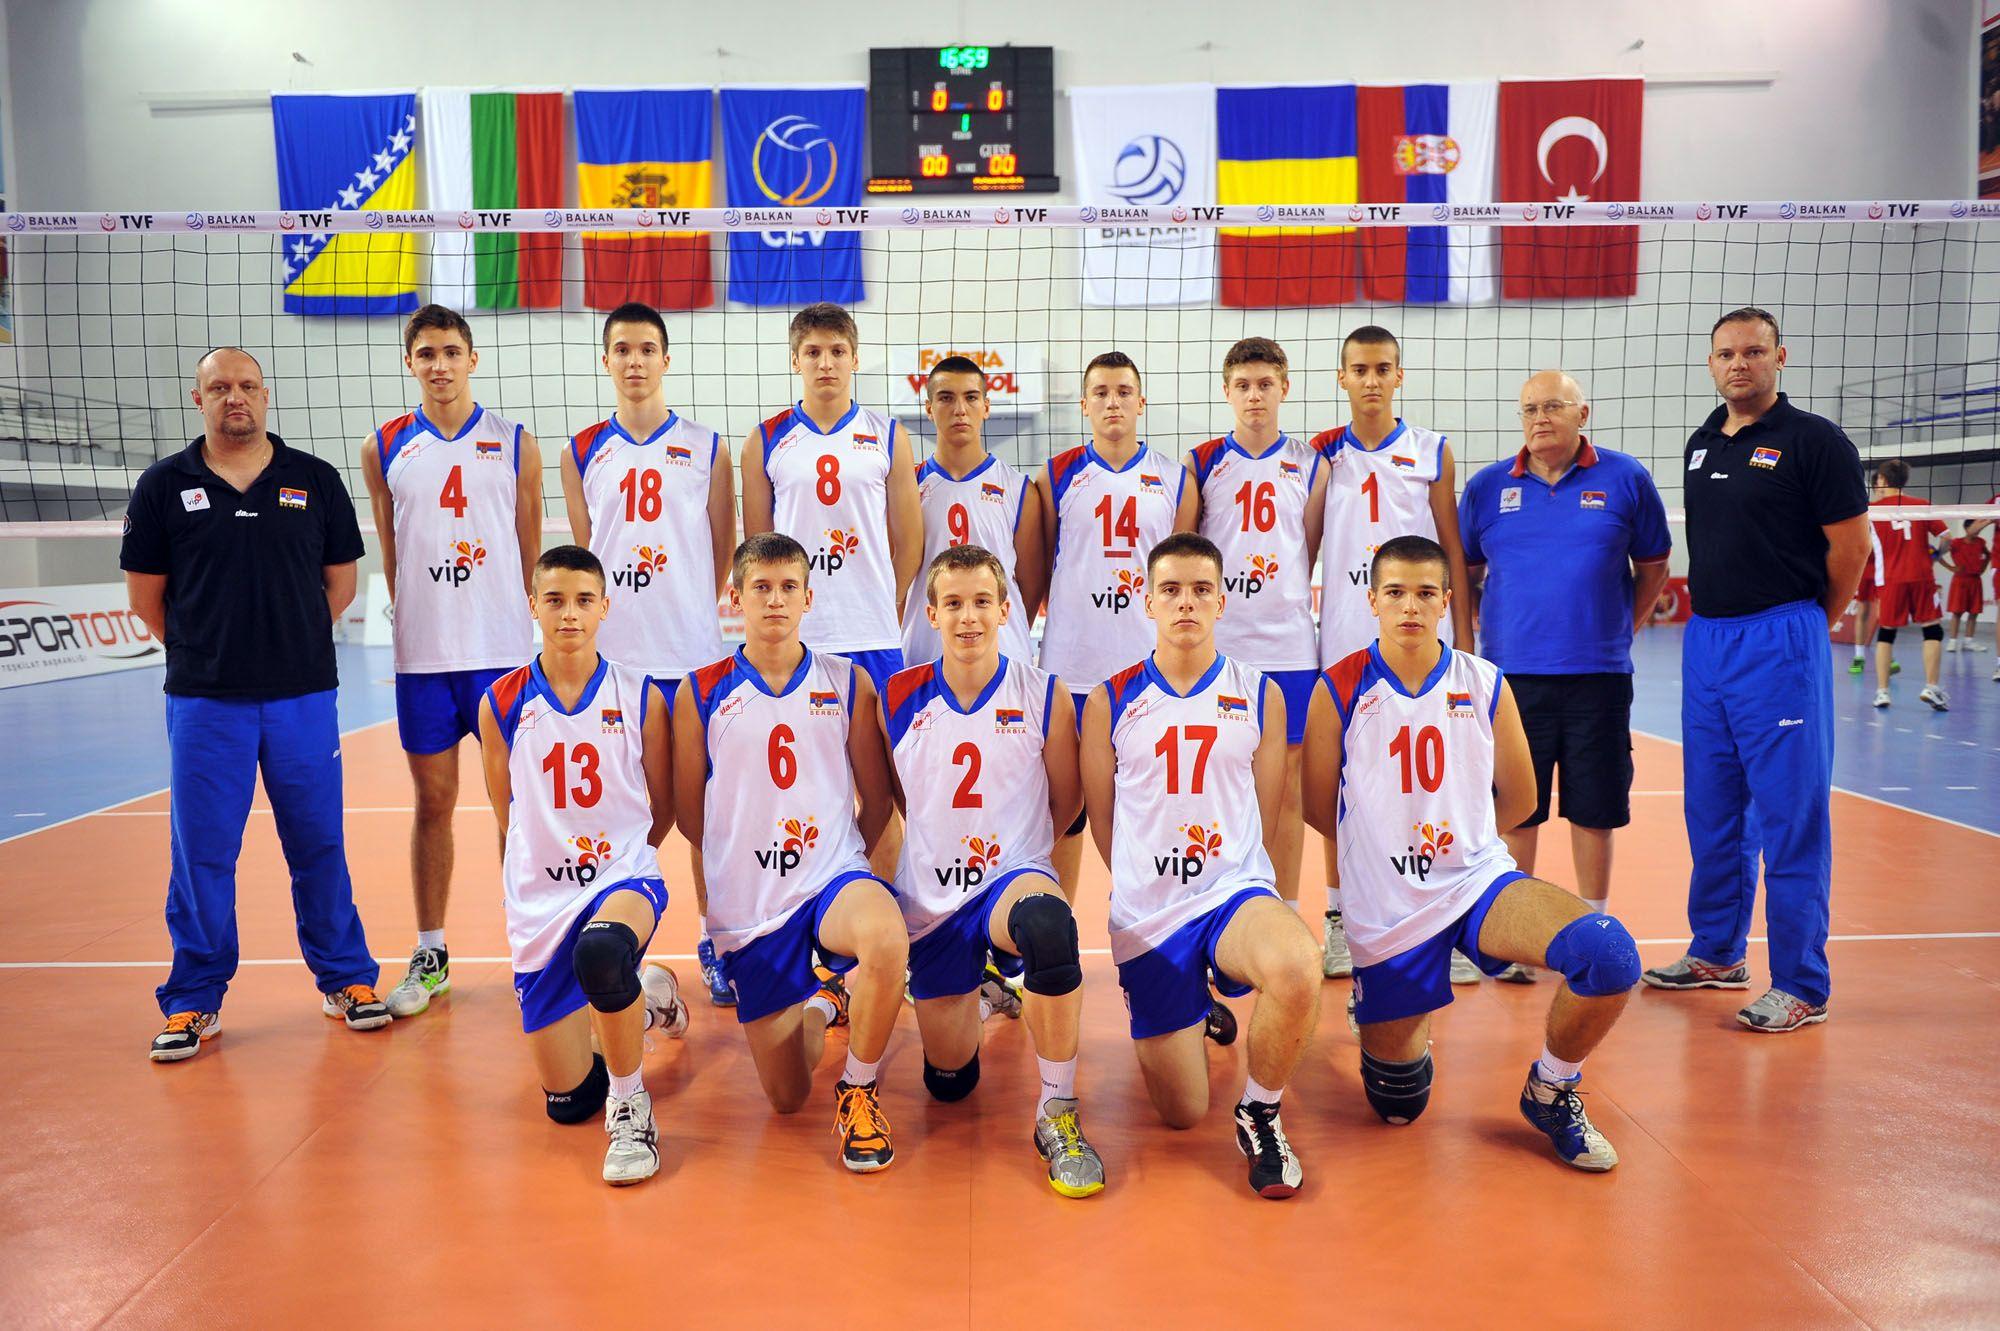 Pioniri Srbije Cetvrti Na Balkanijadi U Ankari Pre Youth Boys Of Serbia 4th At The Balkan Championship In Ankara With Images Teams Basketball Court Boys